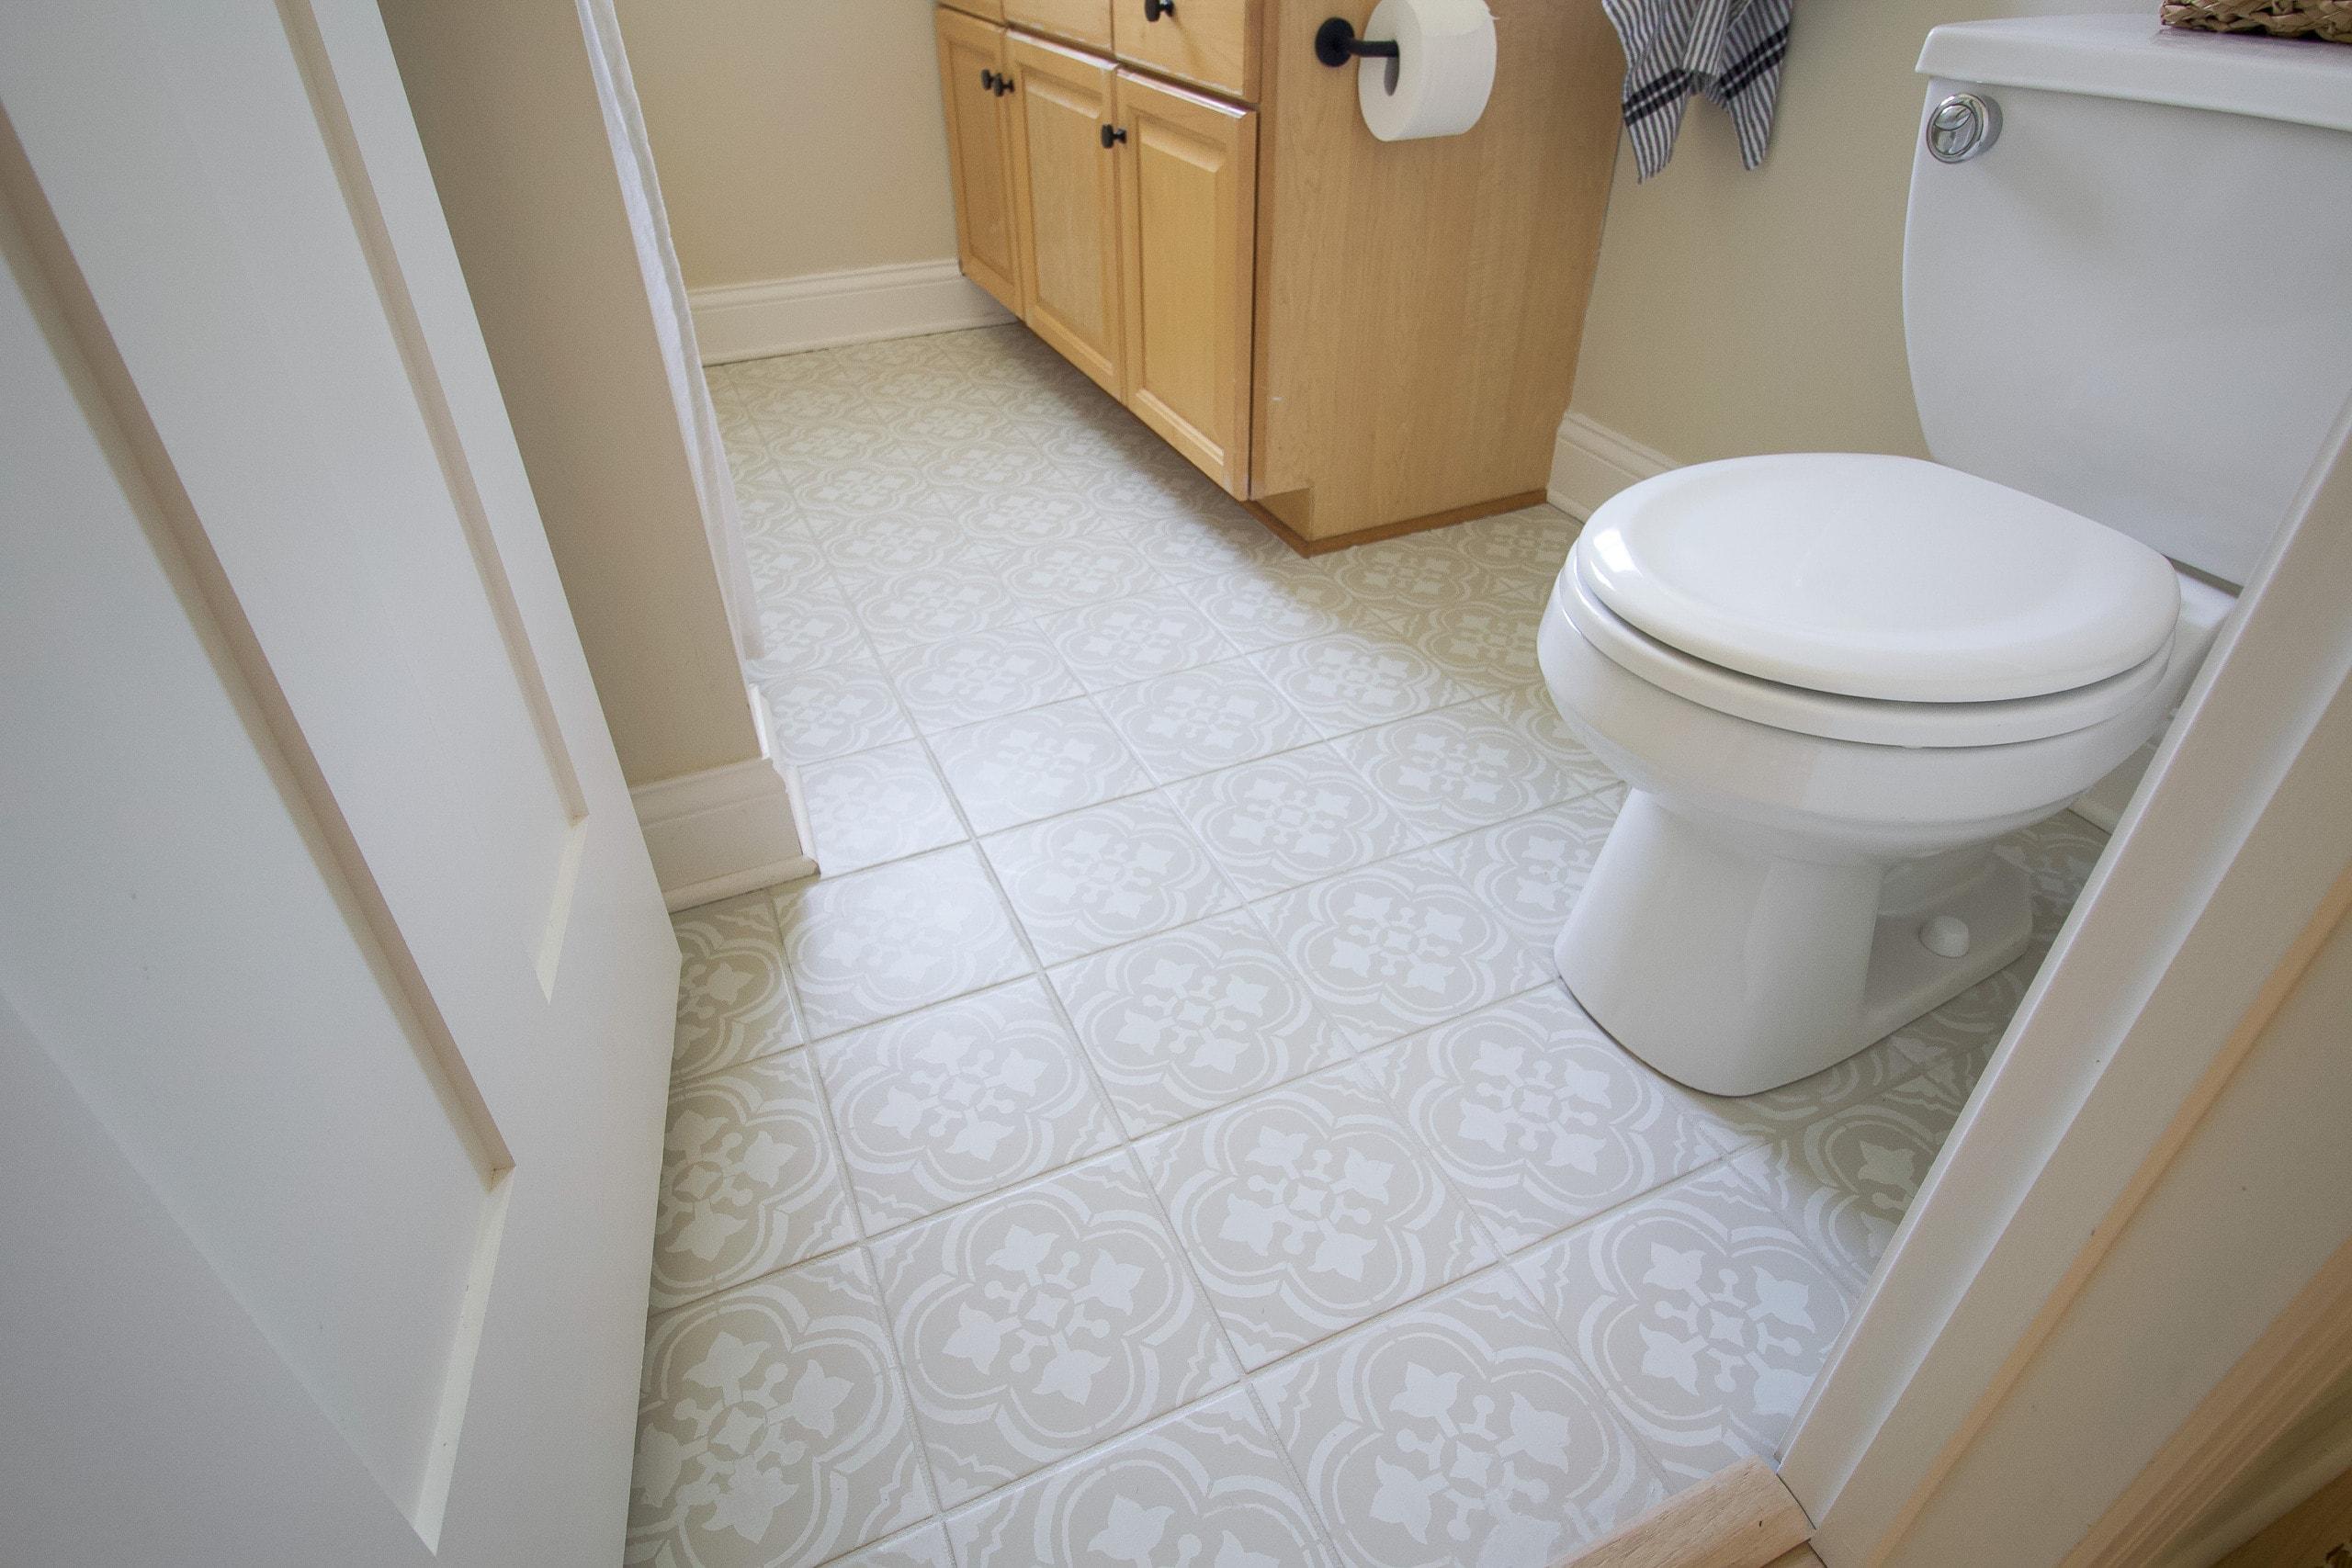 How to paint tile floor